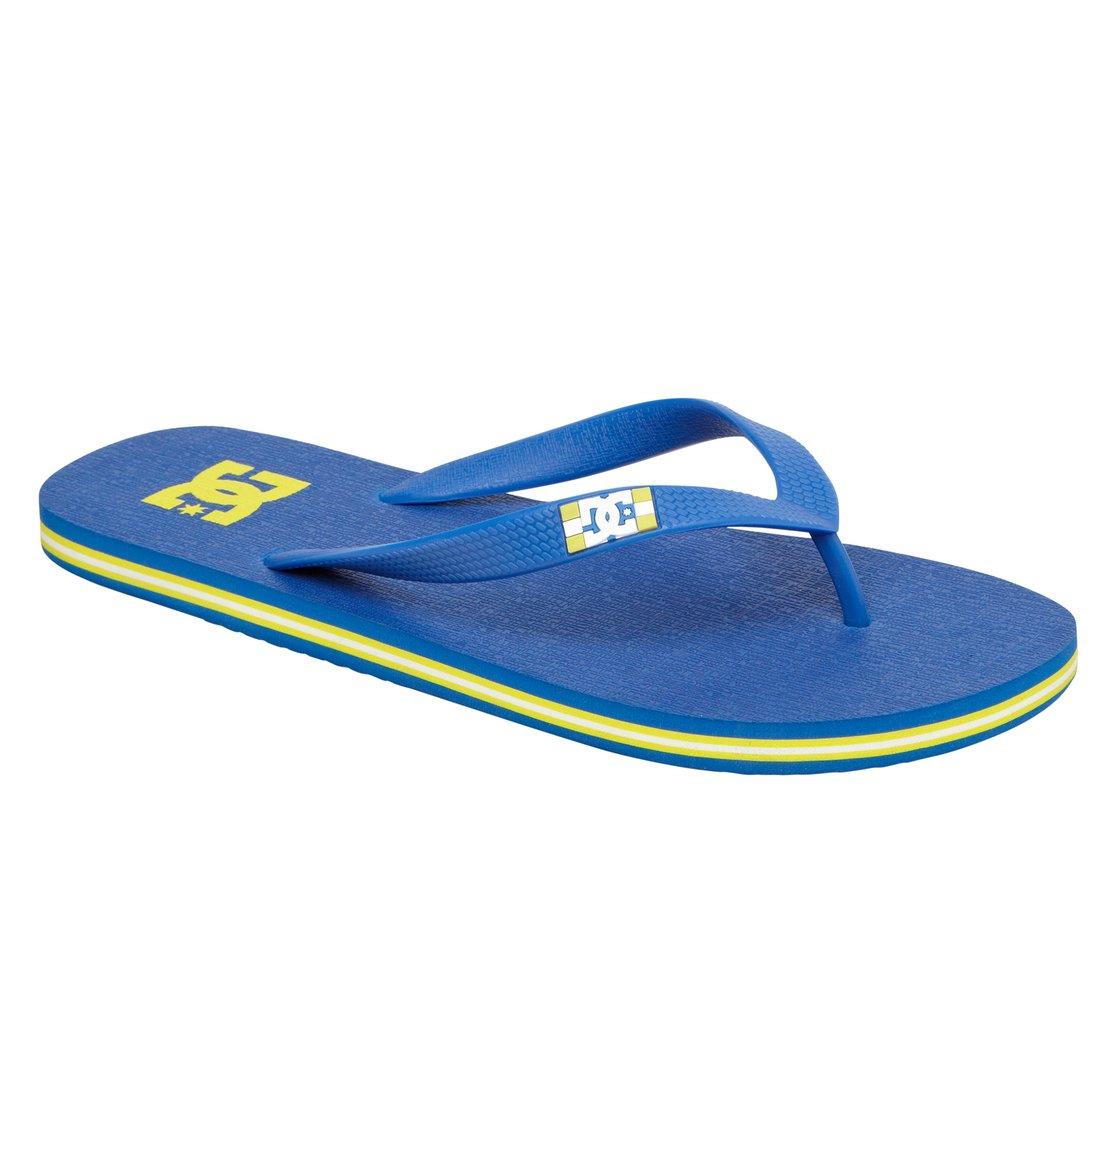 Mens DC Men's Spray Sandal On Sales Size 44